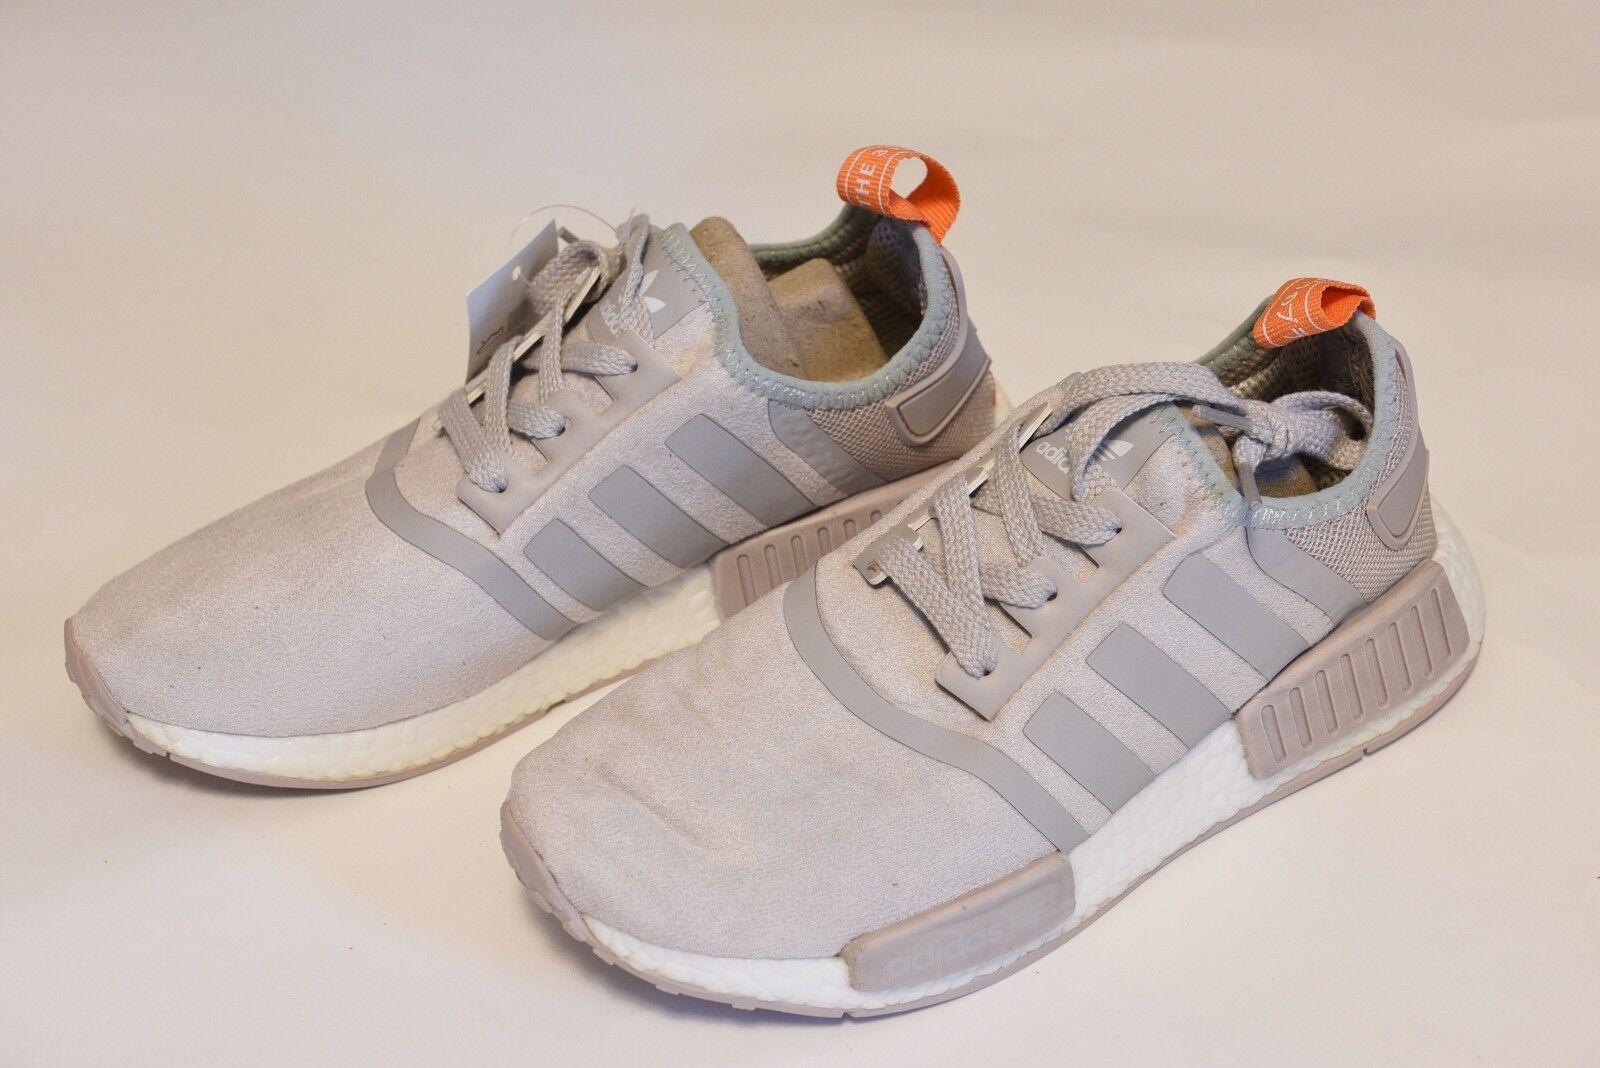 Adidas NMD Talla Runner gris Salmón Rosa Talla NMD 7 e7c5b6